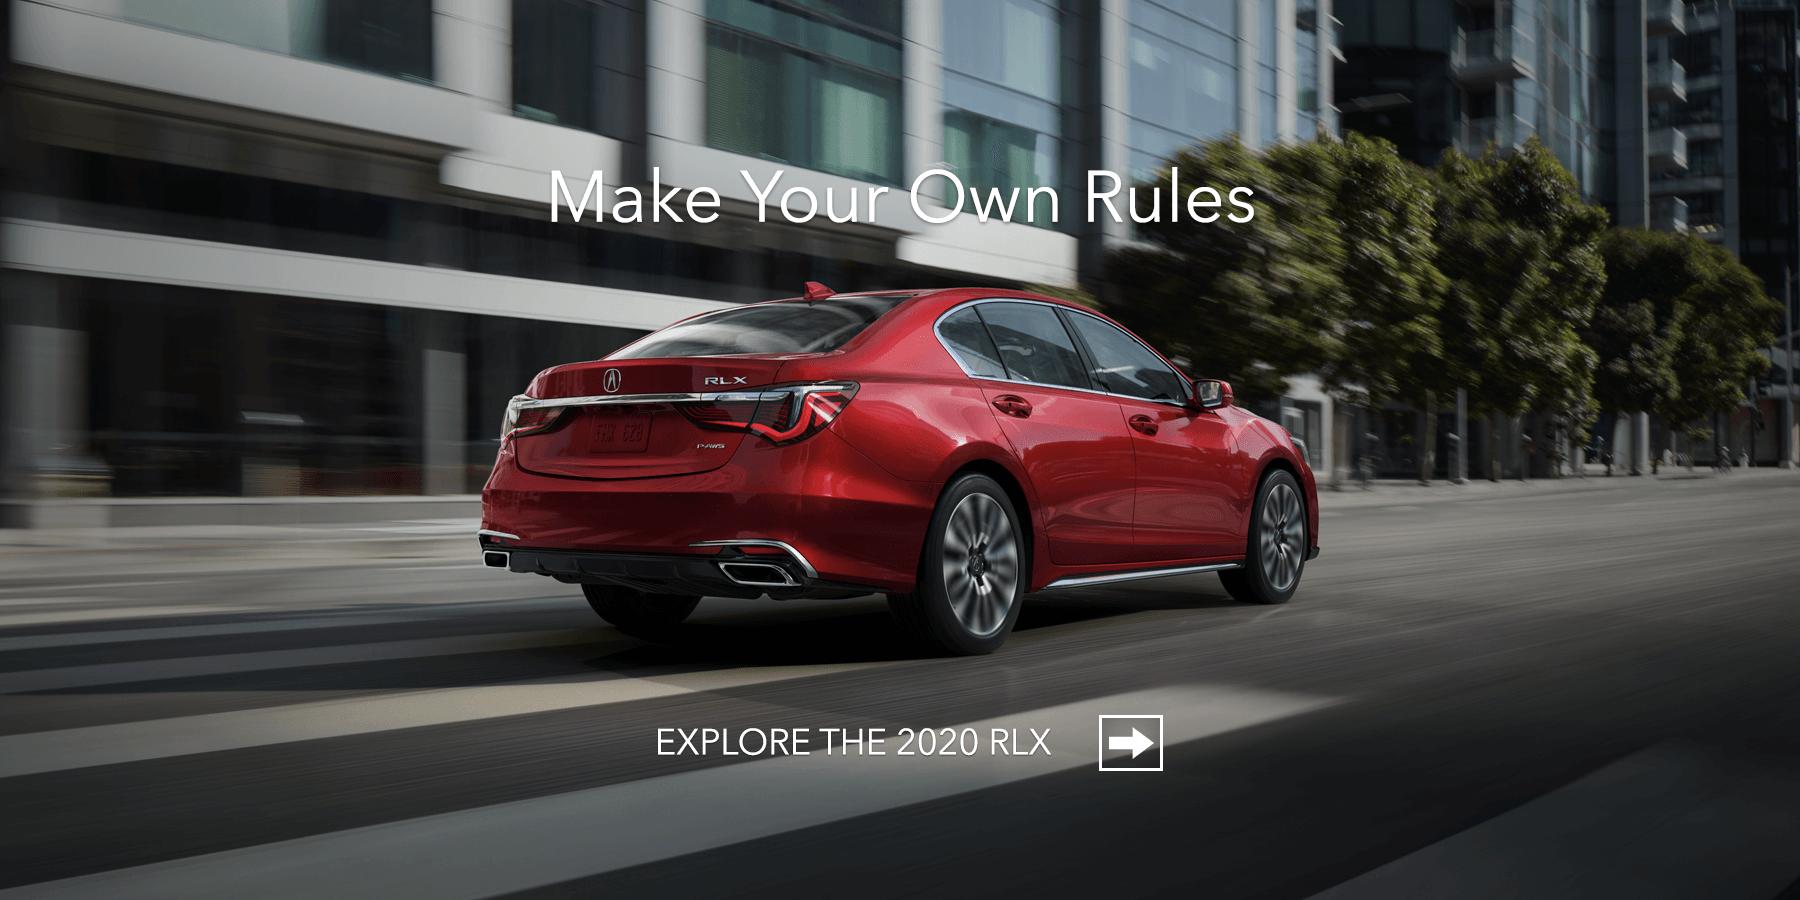 2020 Acura RLX Brilliant Red Metallic Rear Angle HP Slide